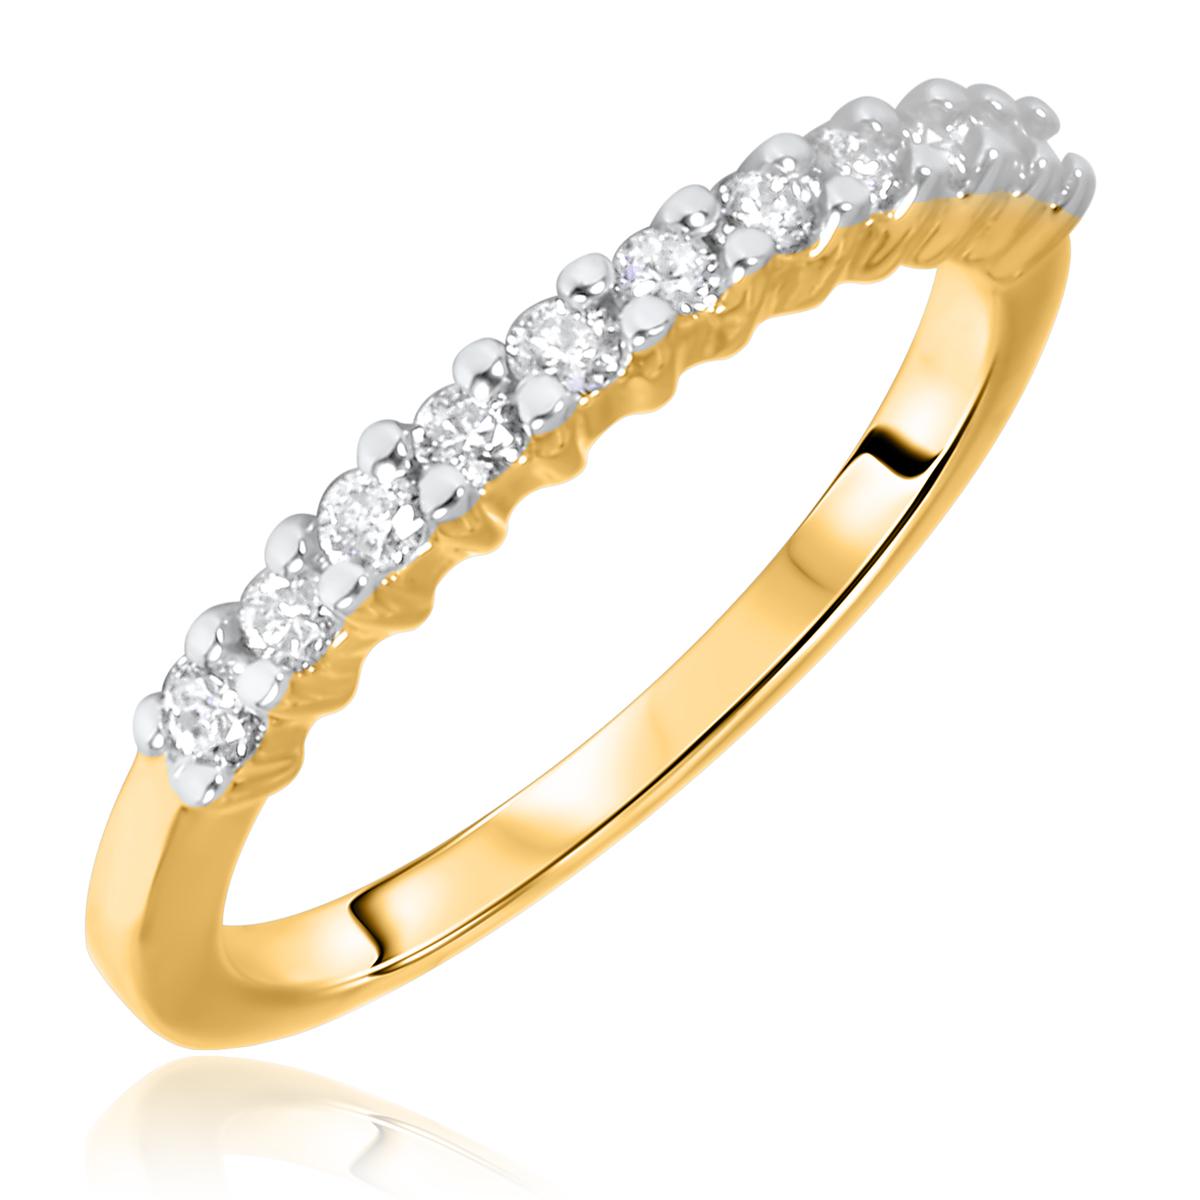 1/3 Carat T.W. Round Cut 11 Stone Diamond Anniversary Ladies Band 14K Yellow